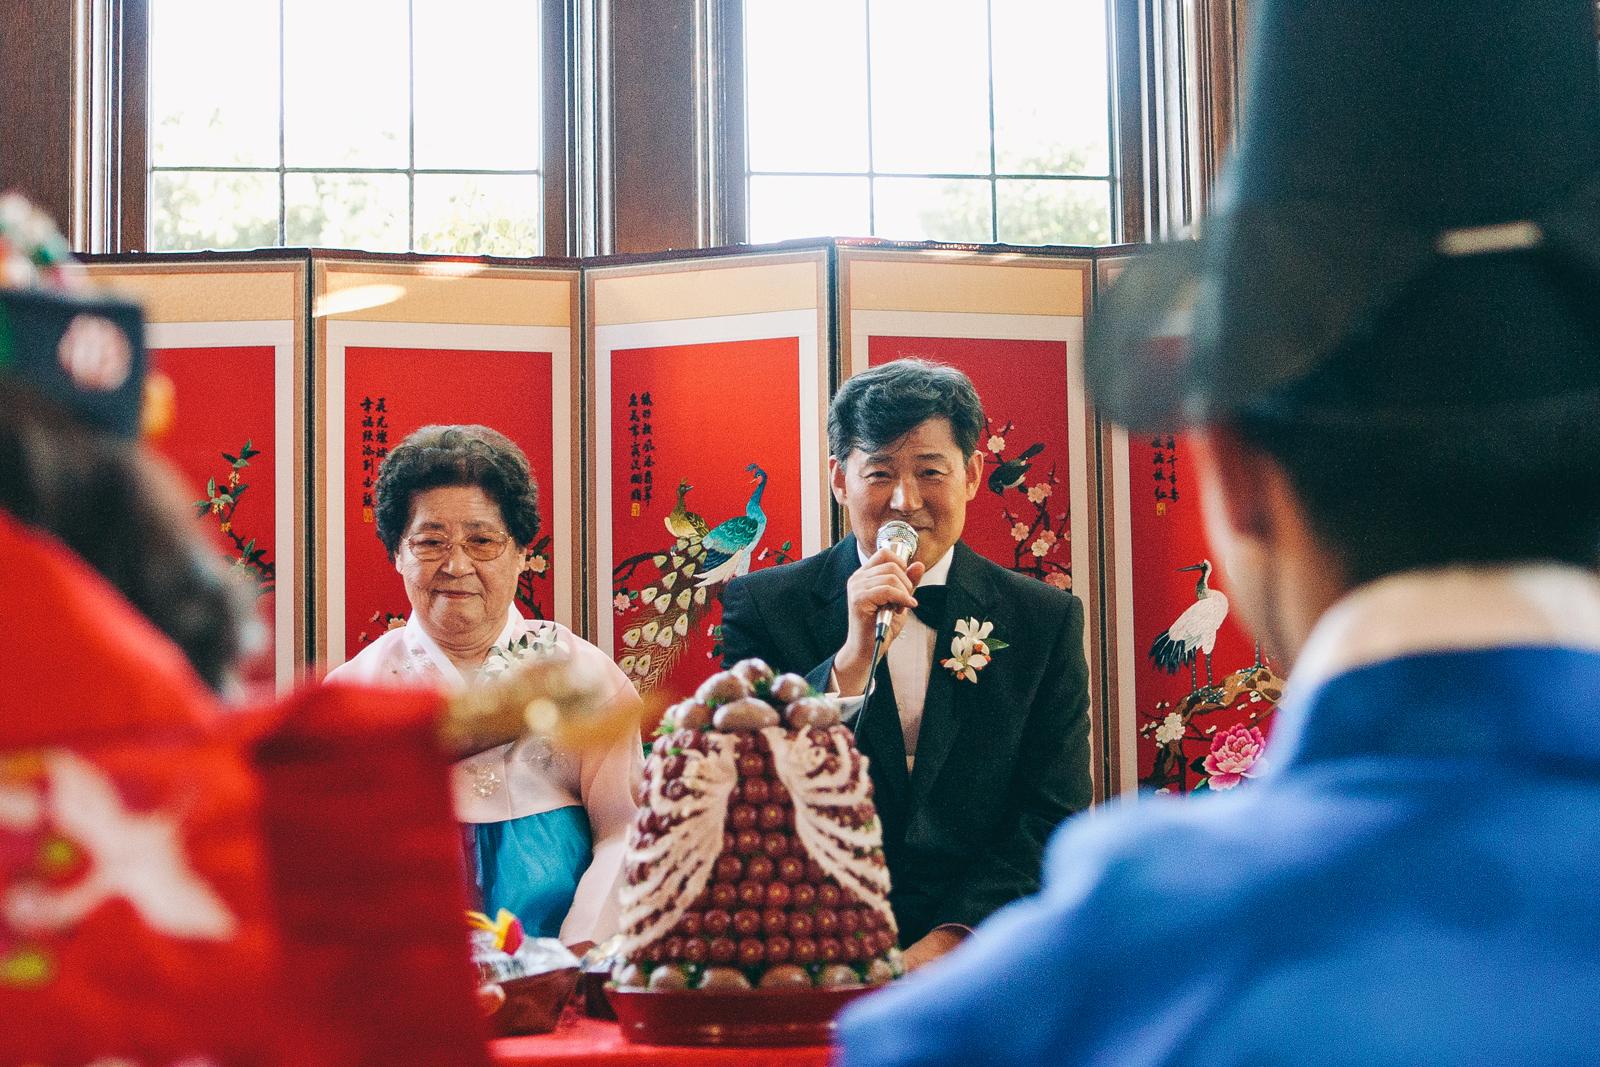 kohl_manison_wedding_photography_sarah_eric_ebony_siovhan_bokeh_photography_067.jpg